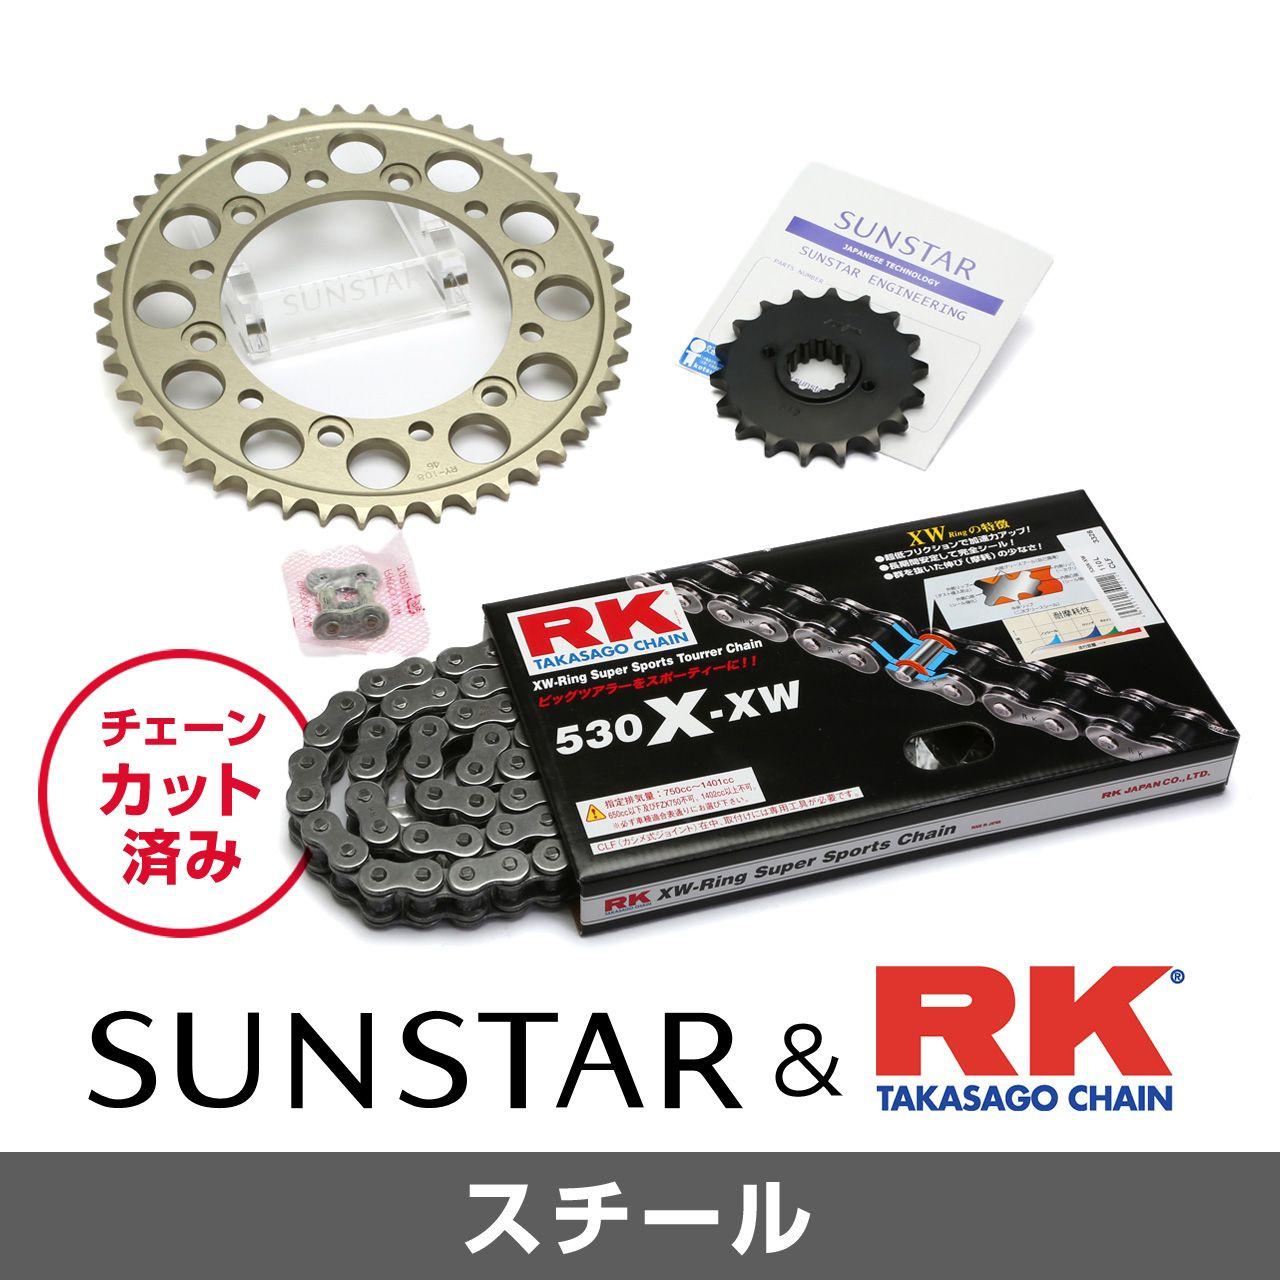 SUNSTAR Front/Rear Sprocket & Chain/Rivet Joint Set